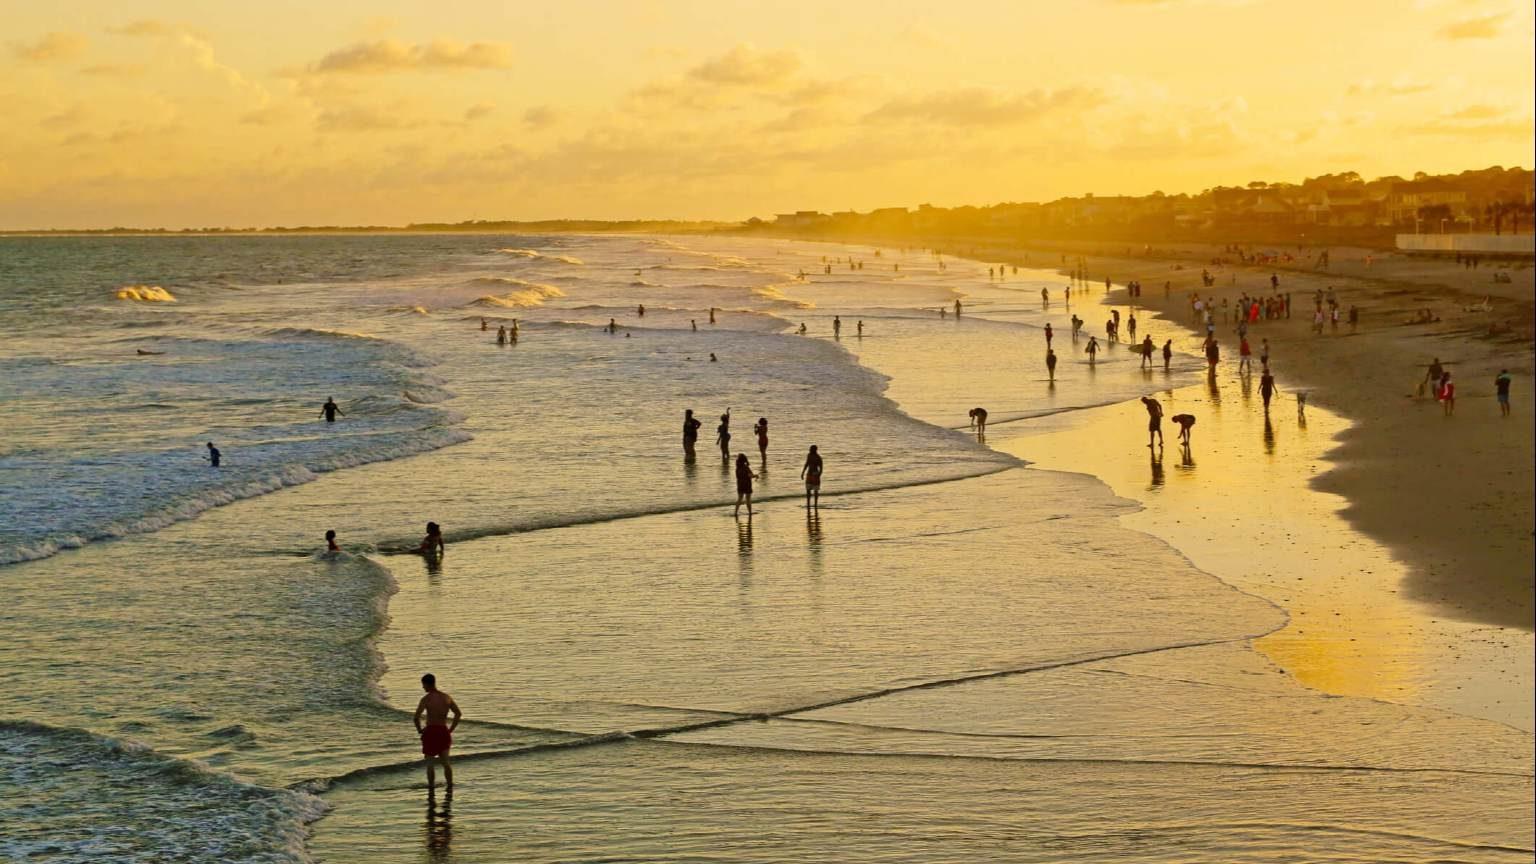 People playing on Folly Beach in Charleston, South Carolina at sunset